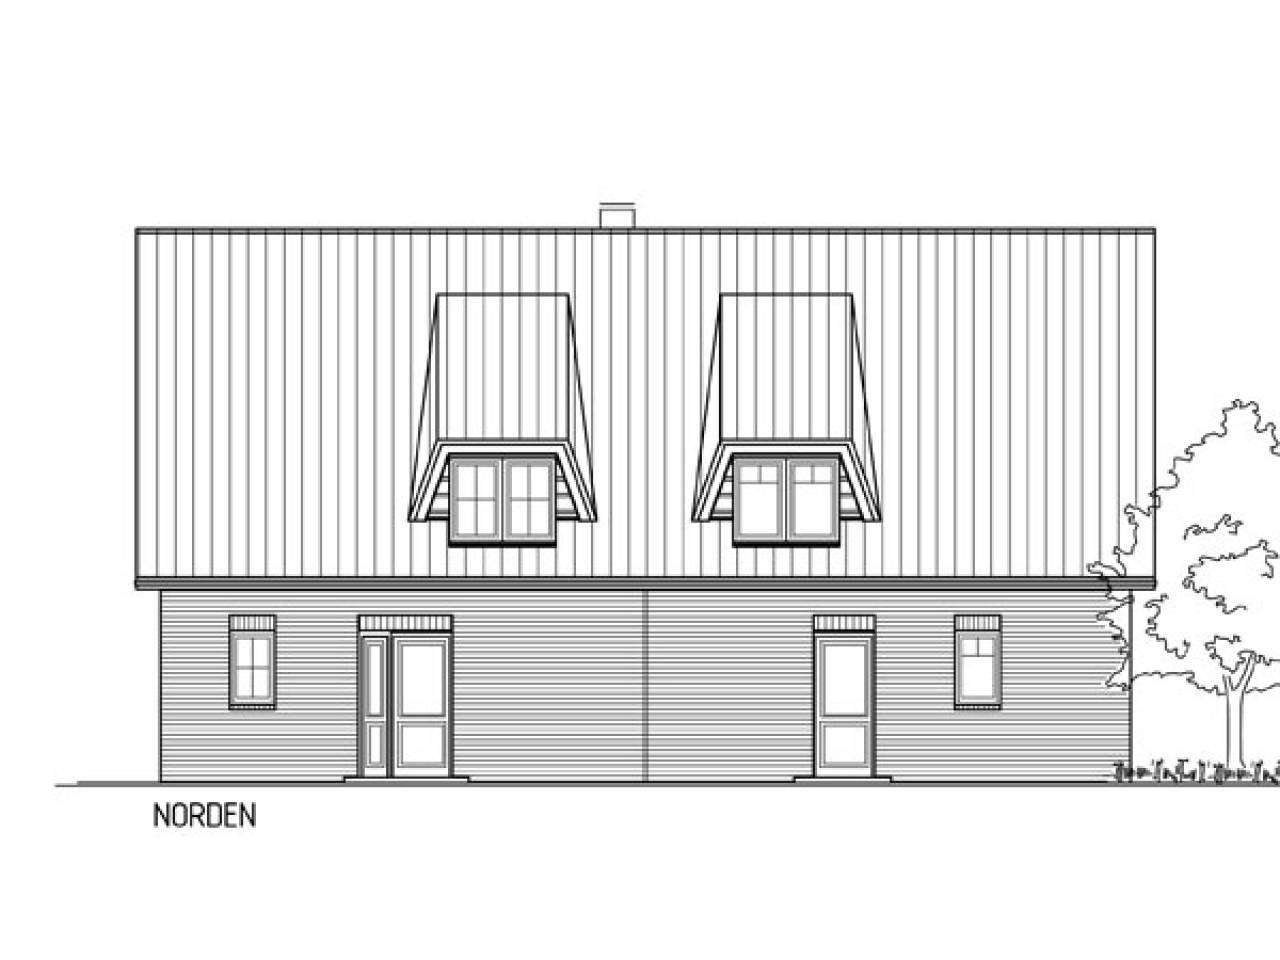 breyer seck bau hausbesichtigung am 17 18 september 2011 in hh niendorf. Black Bedroom Furniture Sets. Home Design Ideas